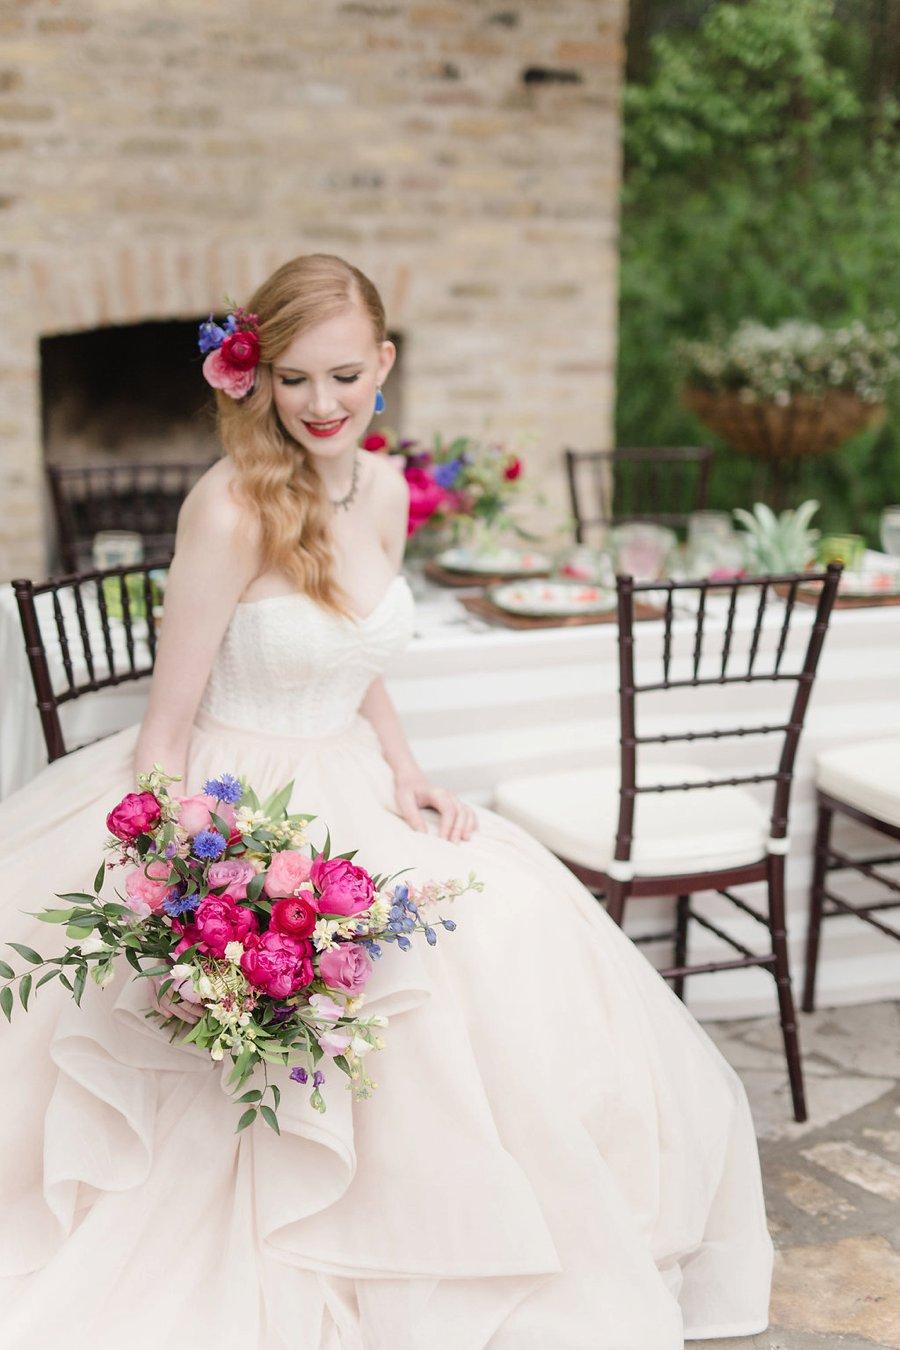 Colorful Modern Fiesta Inspired Wedding Ideas via TheELD.com